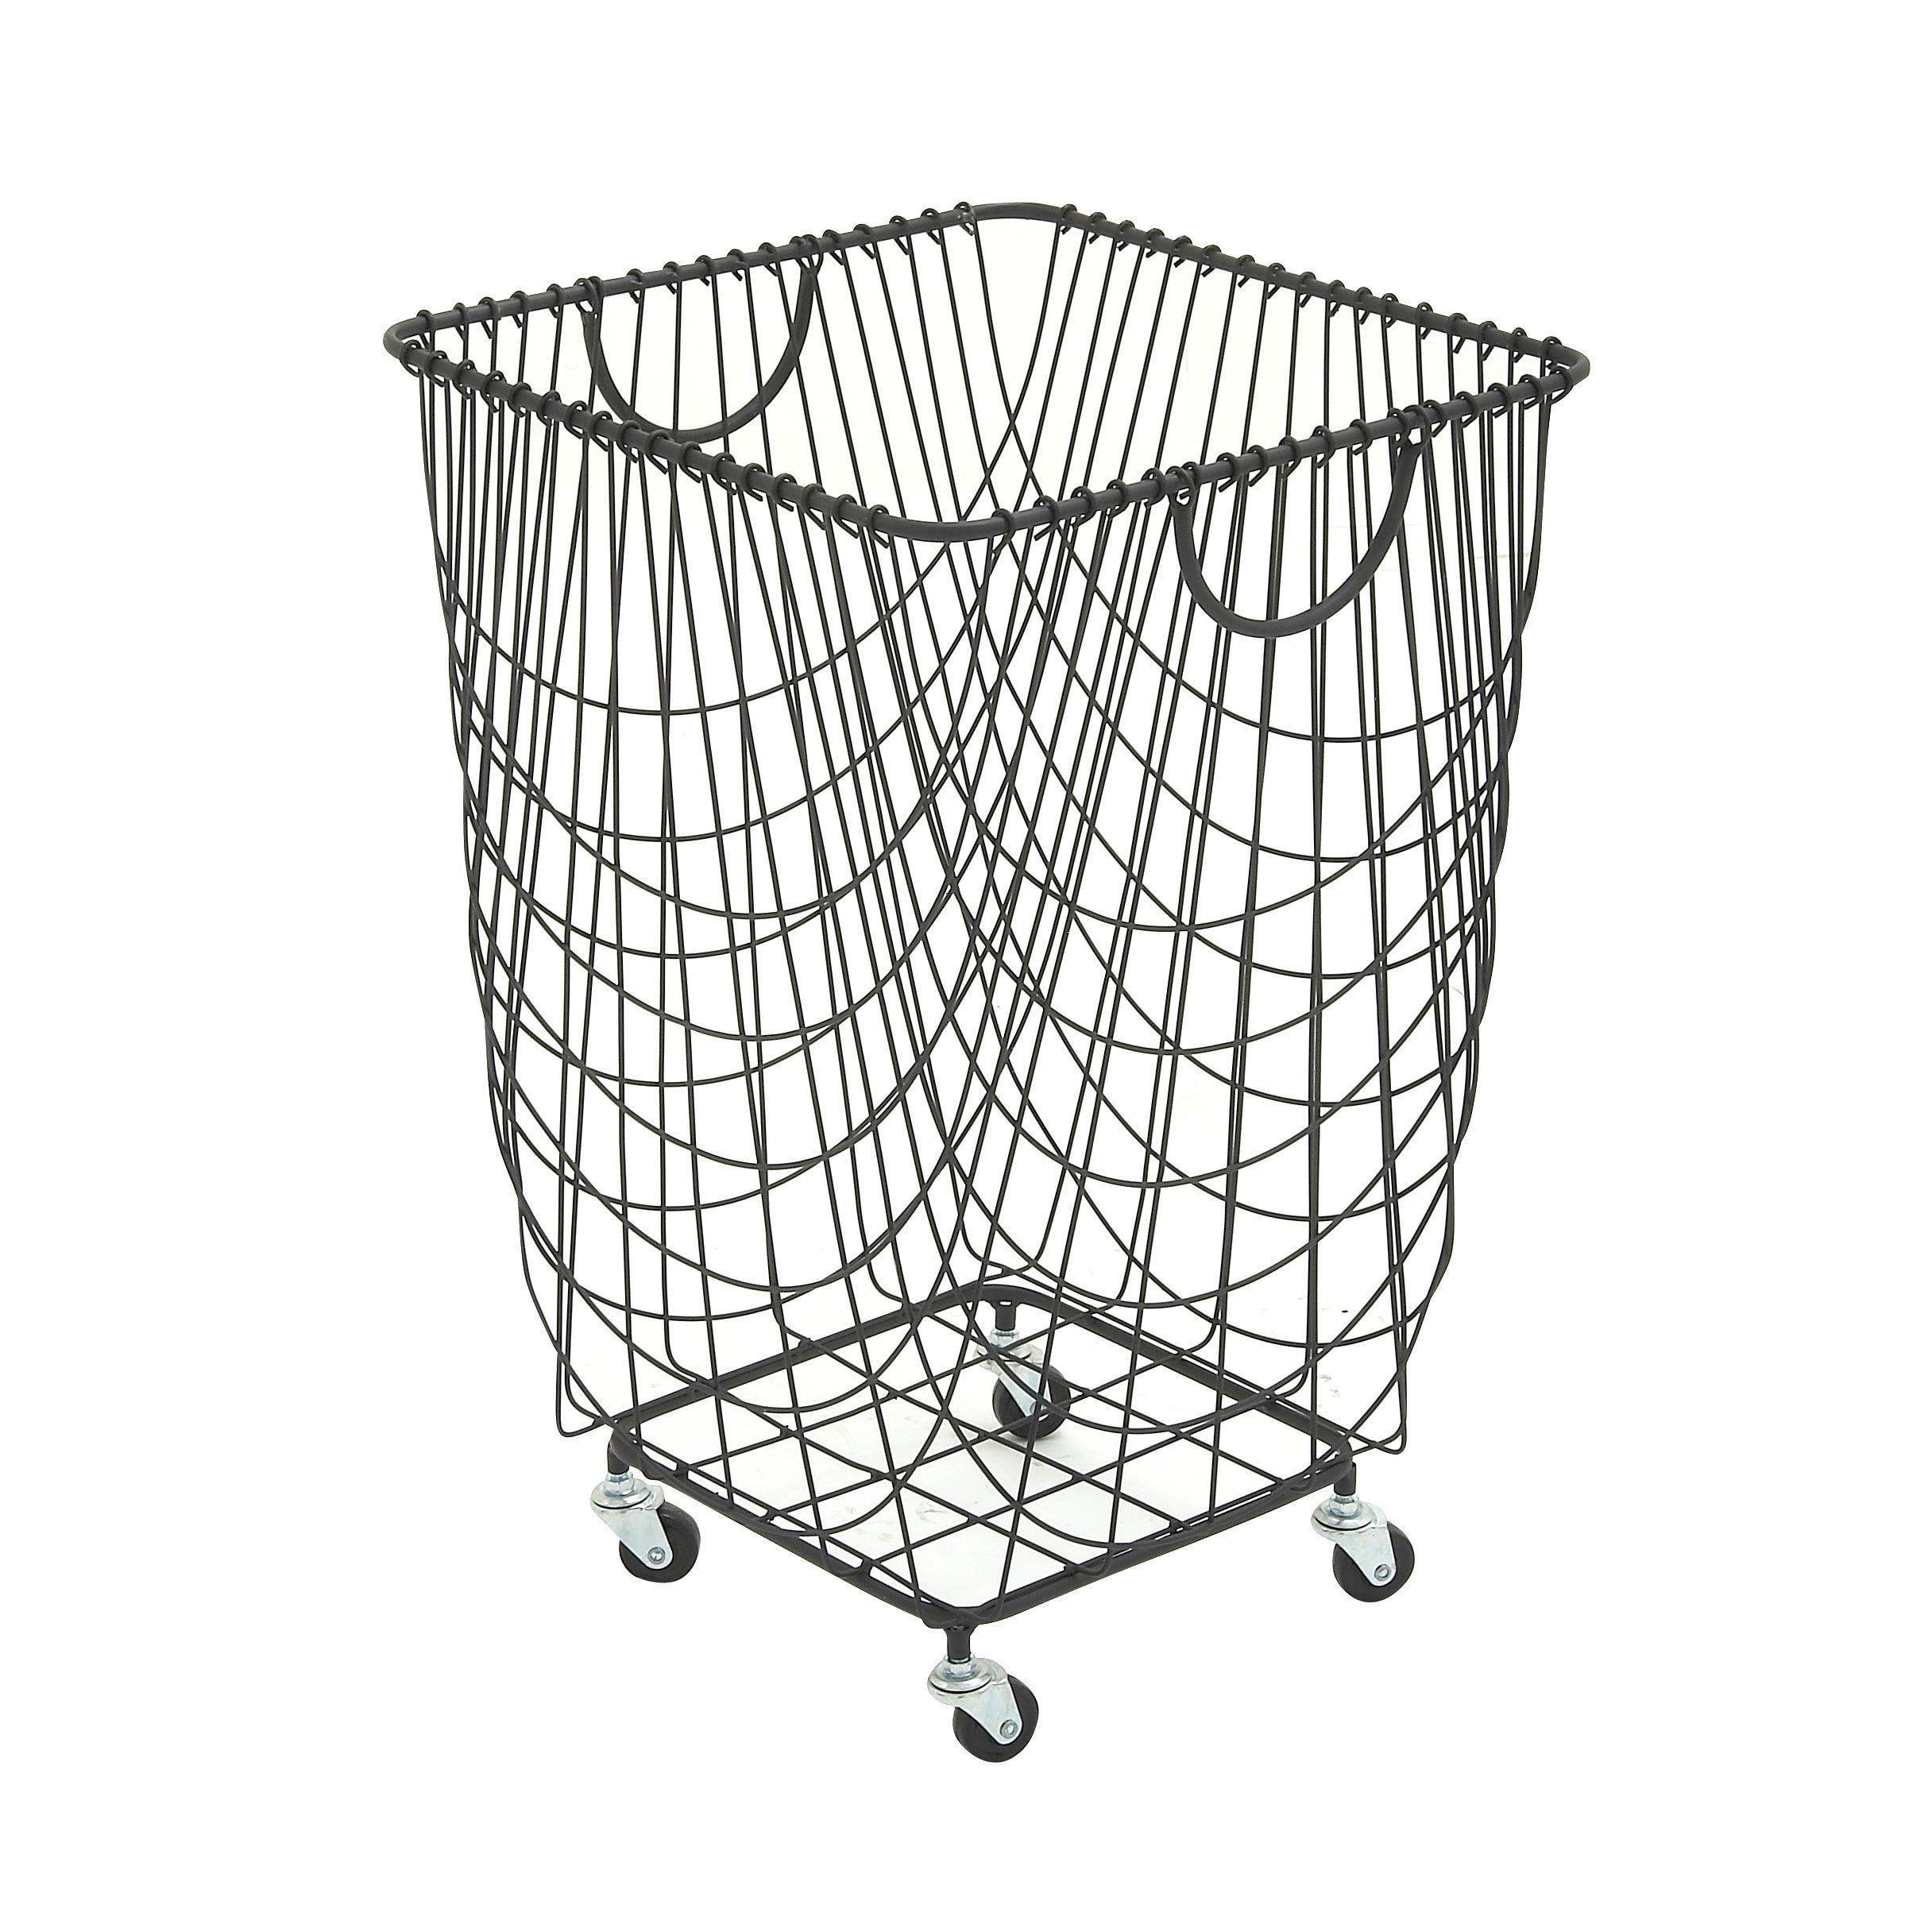 Large Rectangular Black Metal Laundry Basket With Wheels Handles